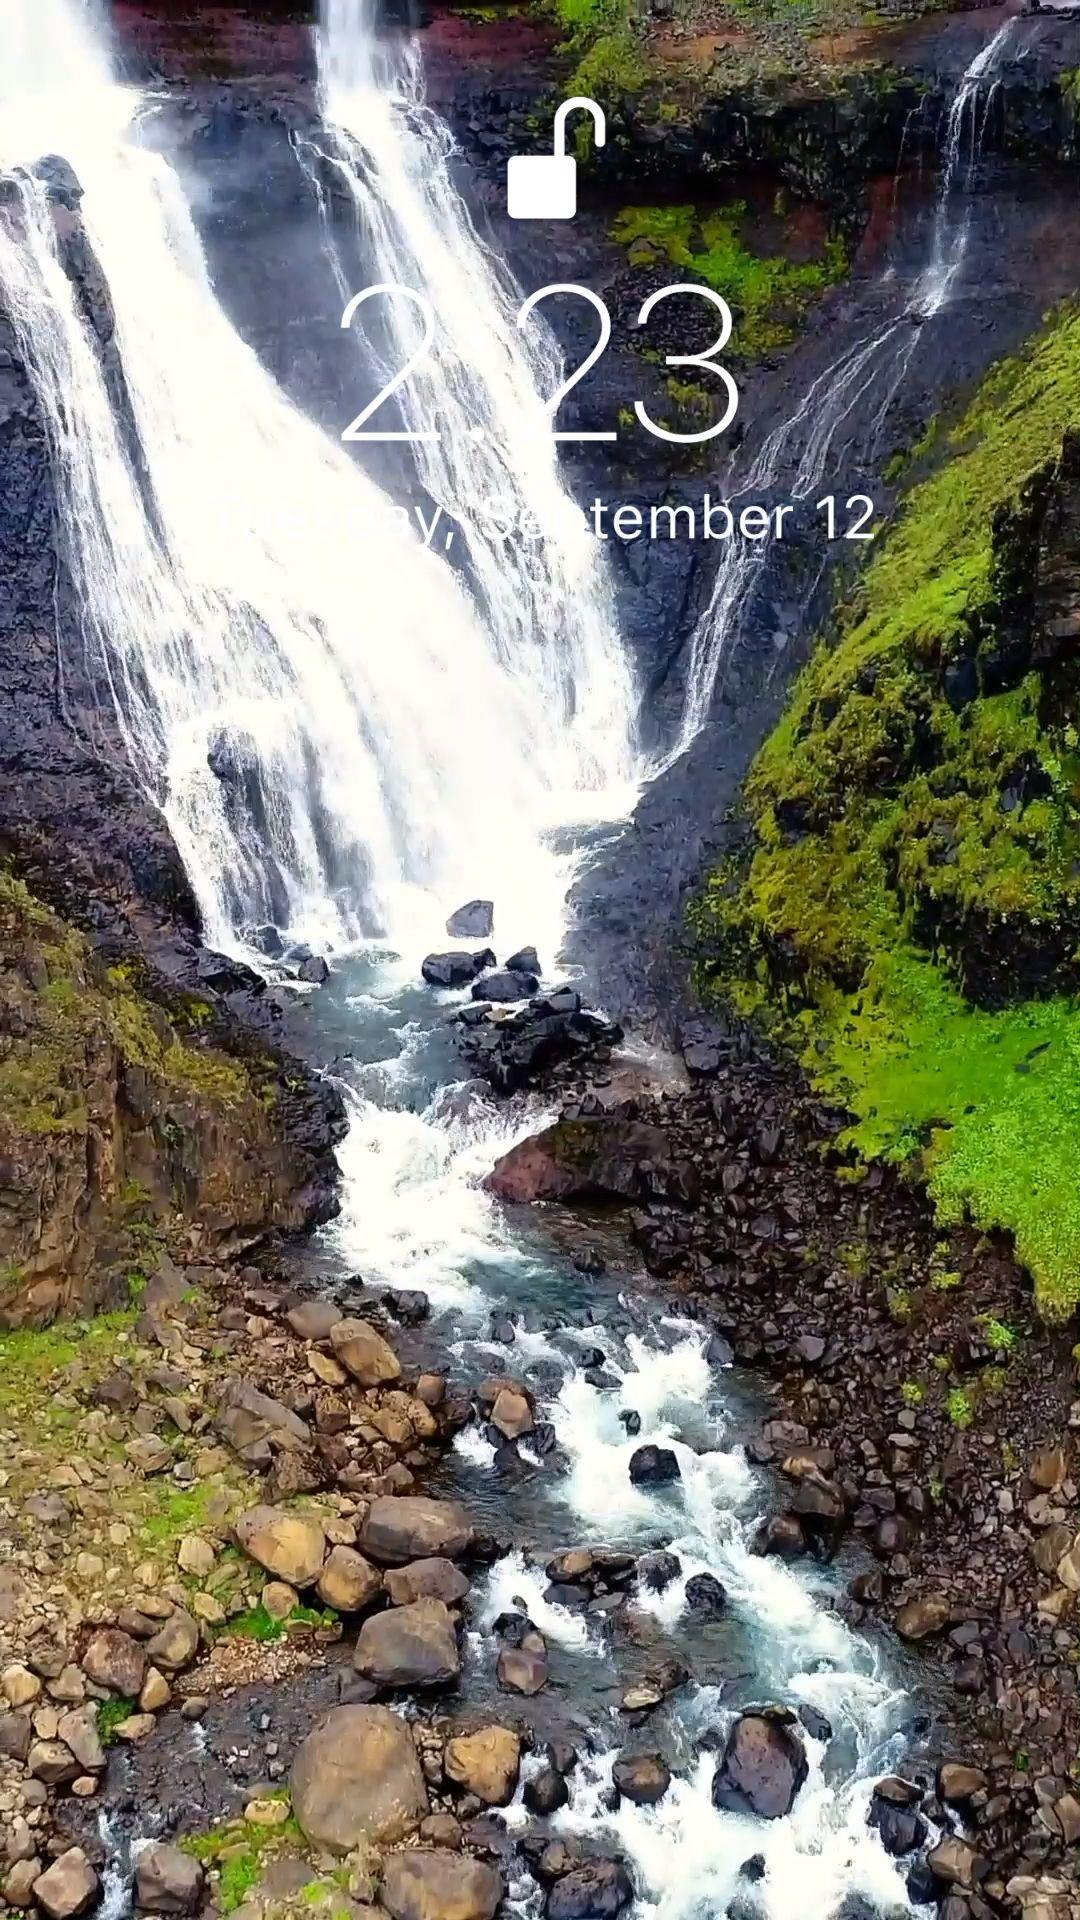 Beautiful Waterfall Wallpaper Video Waterfall Wallpaper Iphone Wallpaper Waterfall Beautiful Nature Wallpaper Hd